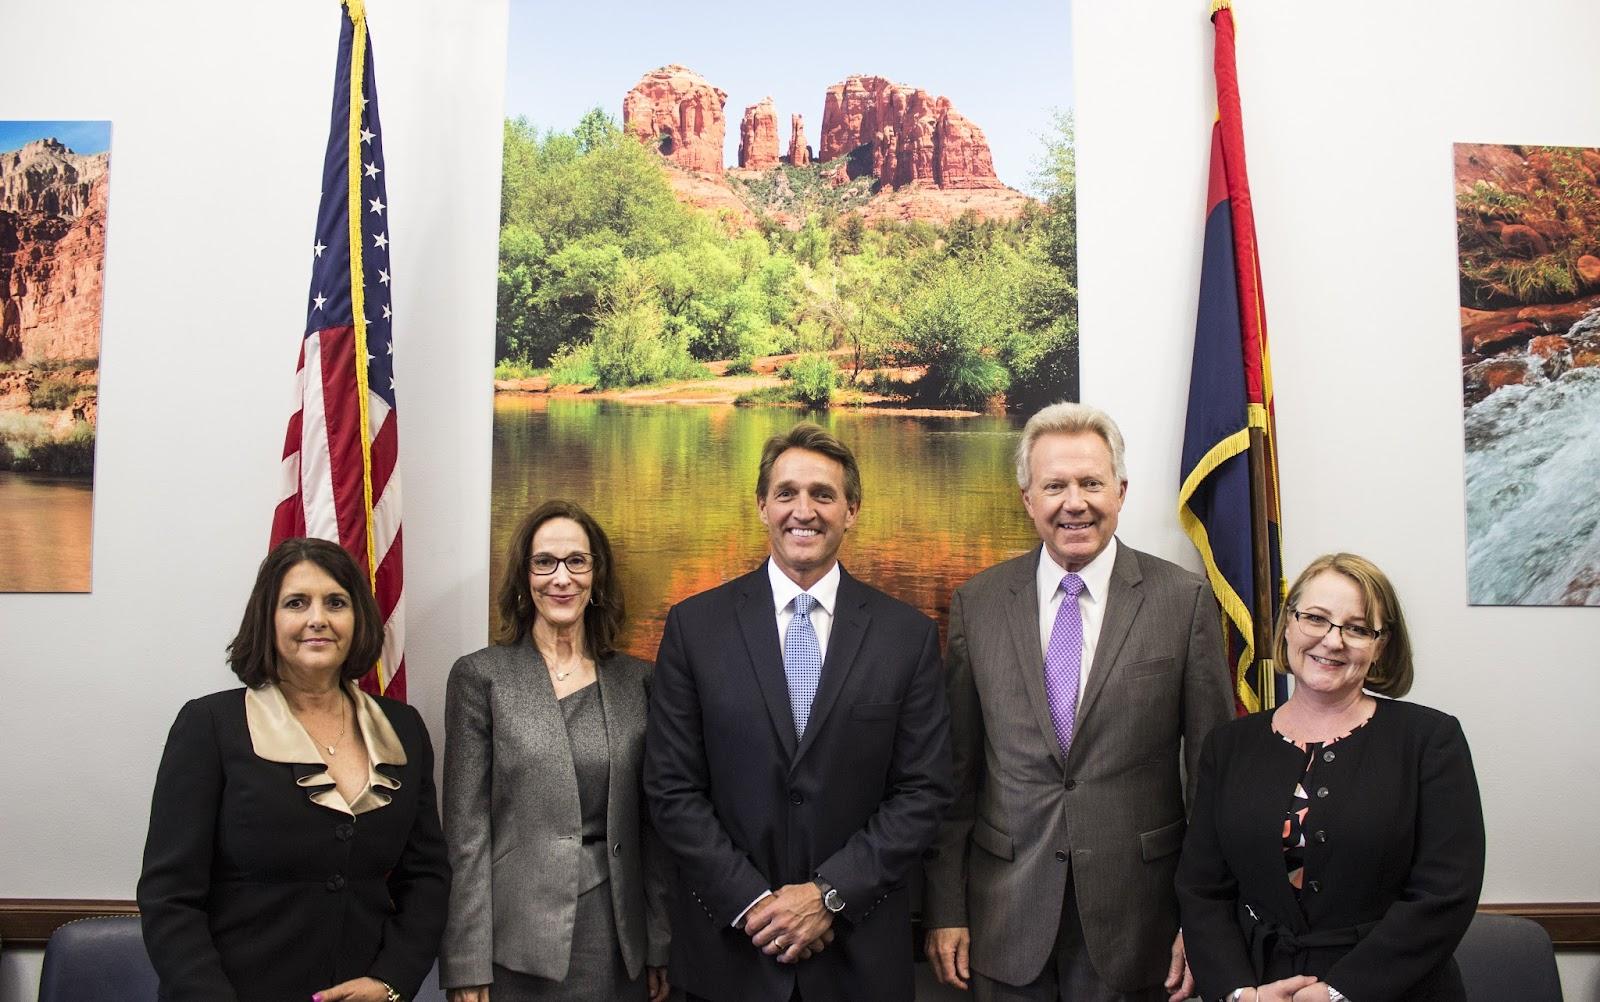 Washington DC CEO Summit 2016 - SENATOR%2BFLAKE%2BPHOTO.jpg